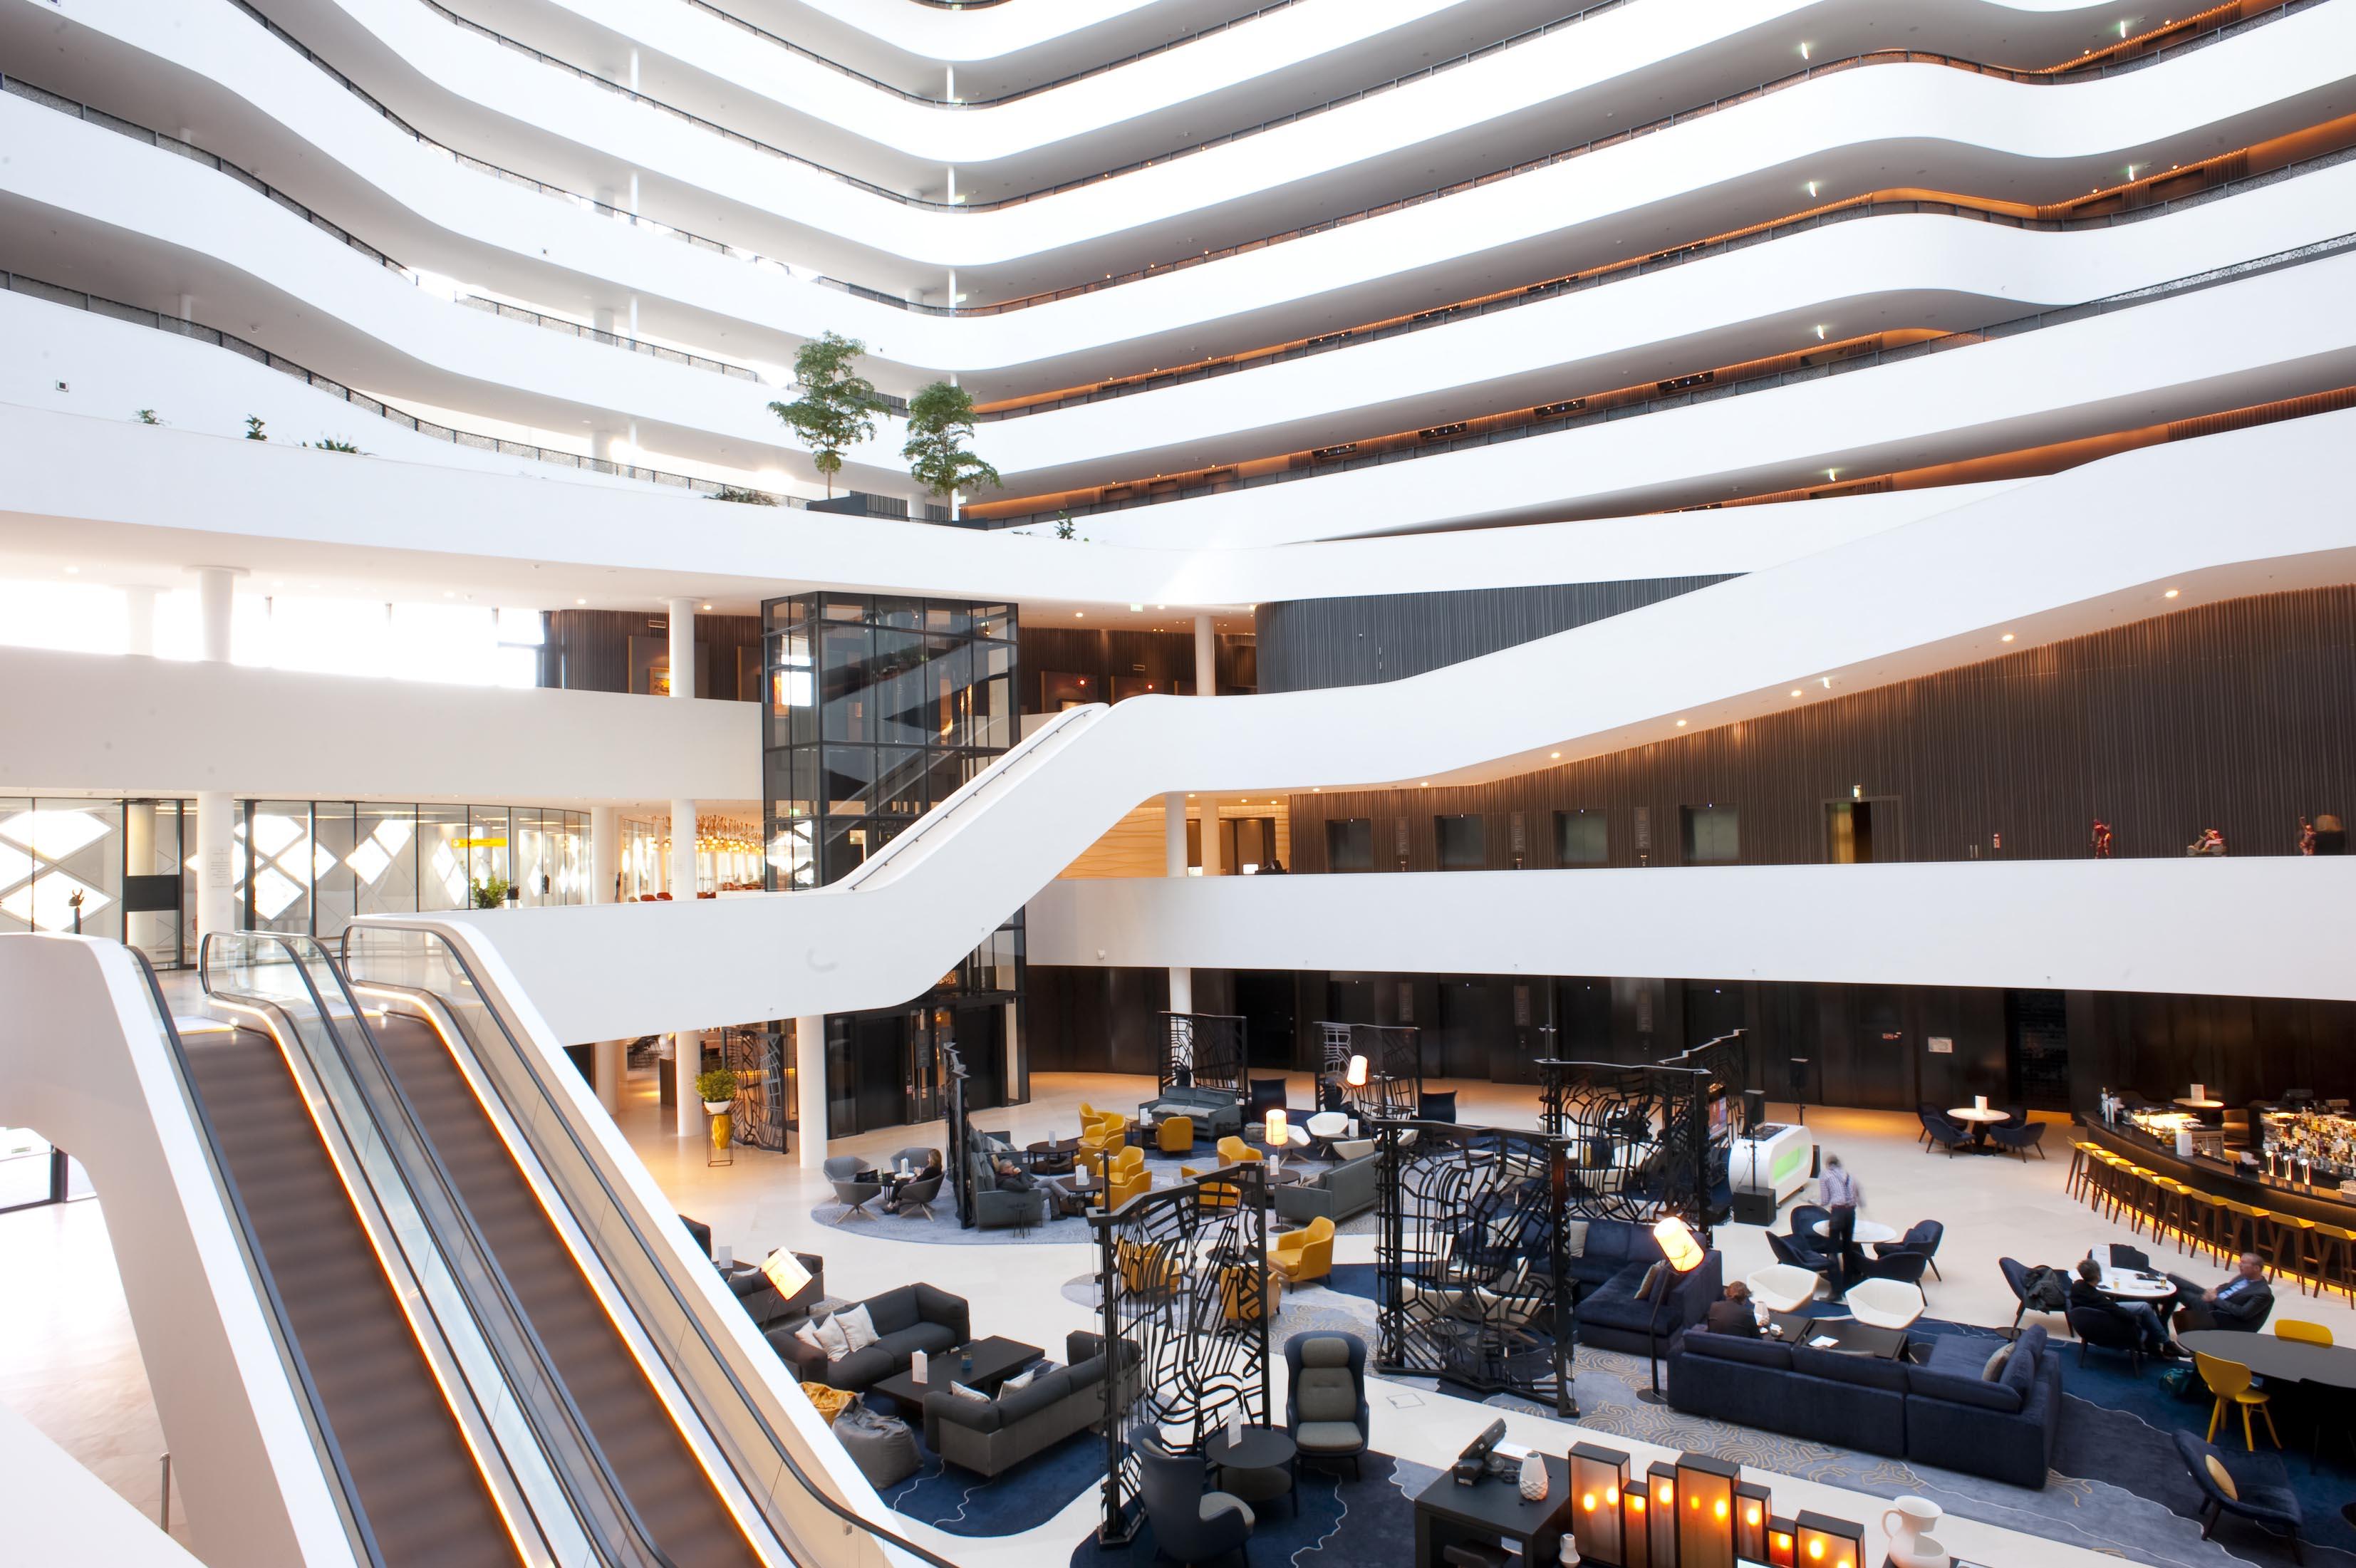 Hilton Airport Schiphol Lobby 6-2